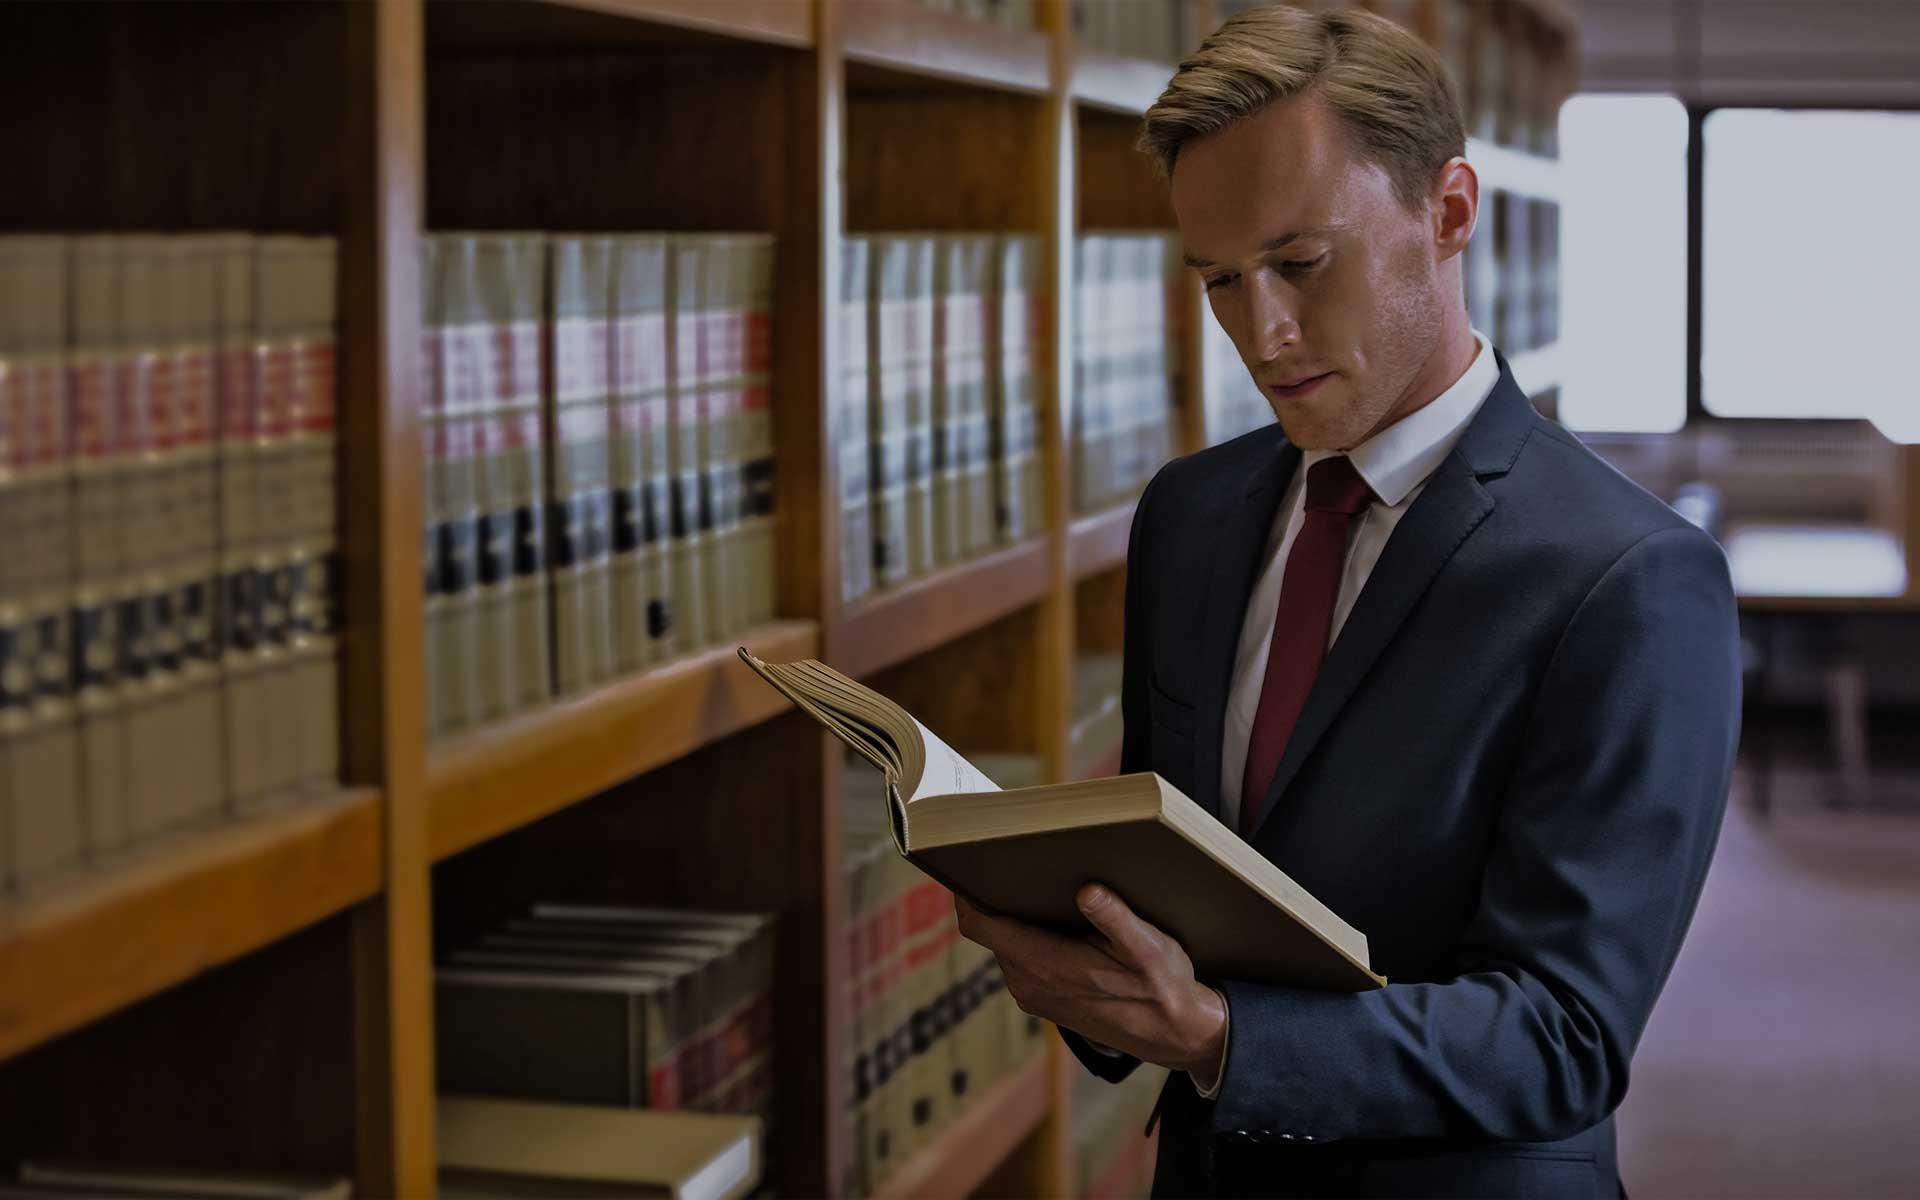 Advogado em Brasília Advogado Brasília Advogado em DF Advogado DF Advogado no DF